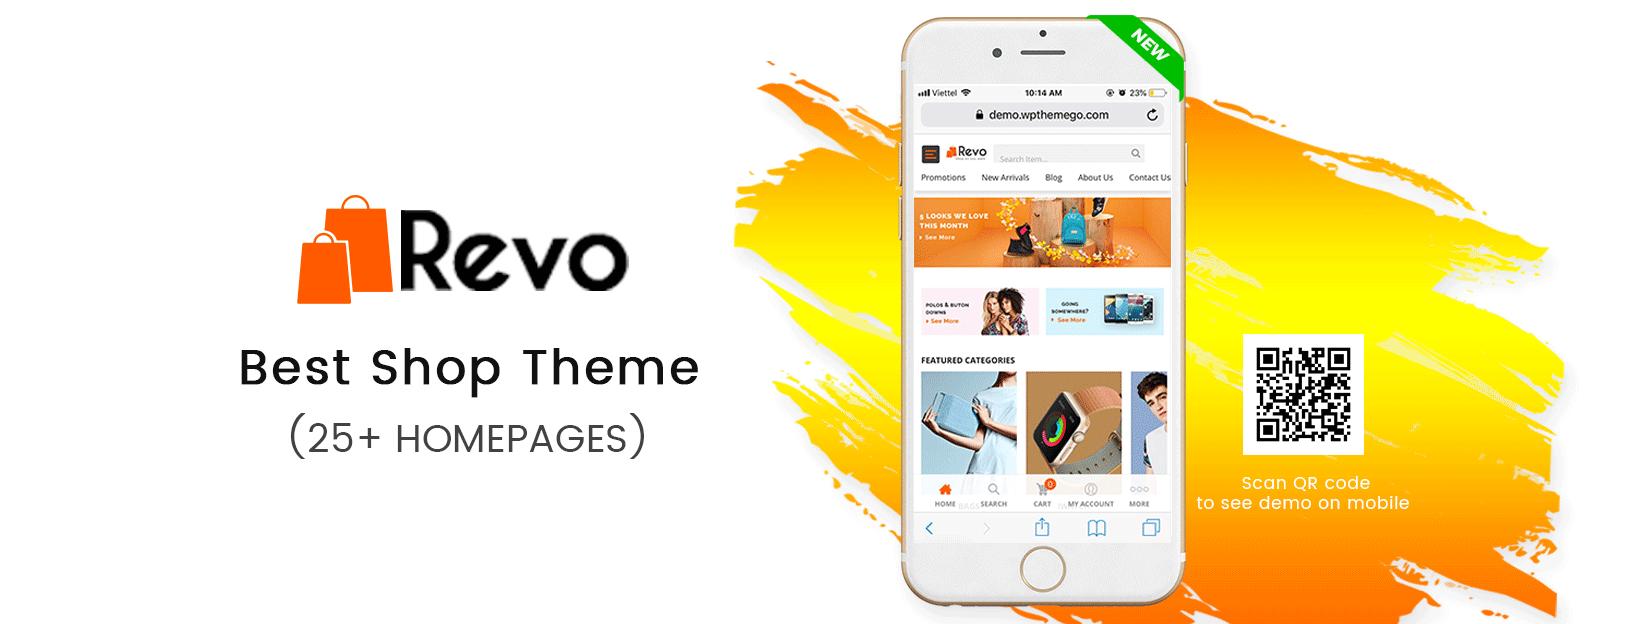 Revo - Best Multipurpose WooCommerce WordPress Theme (25+ Homepages & 5+ Mobile Layouts Ready)